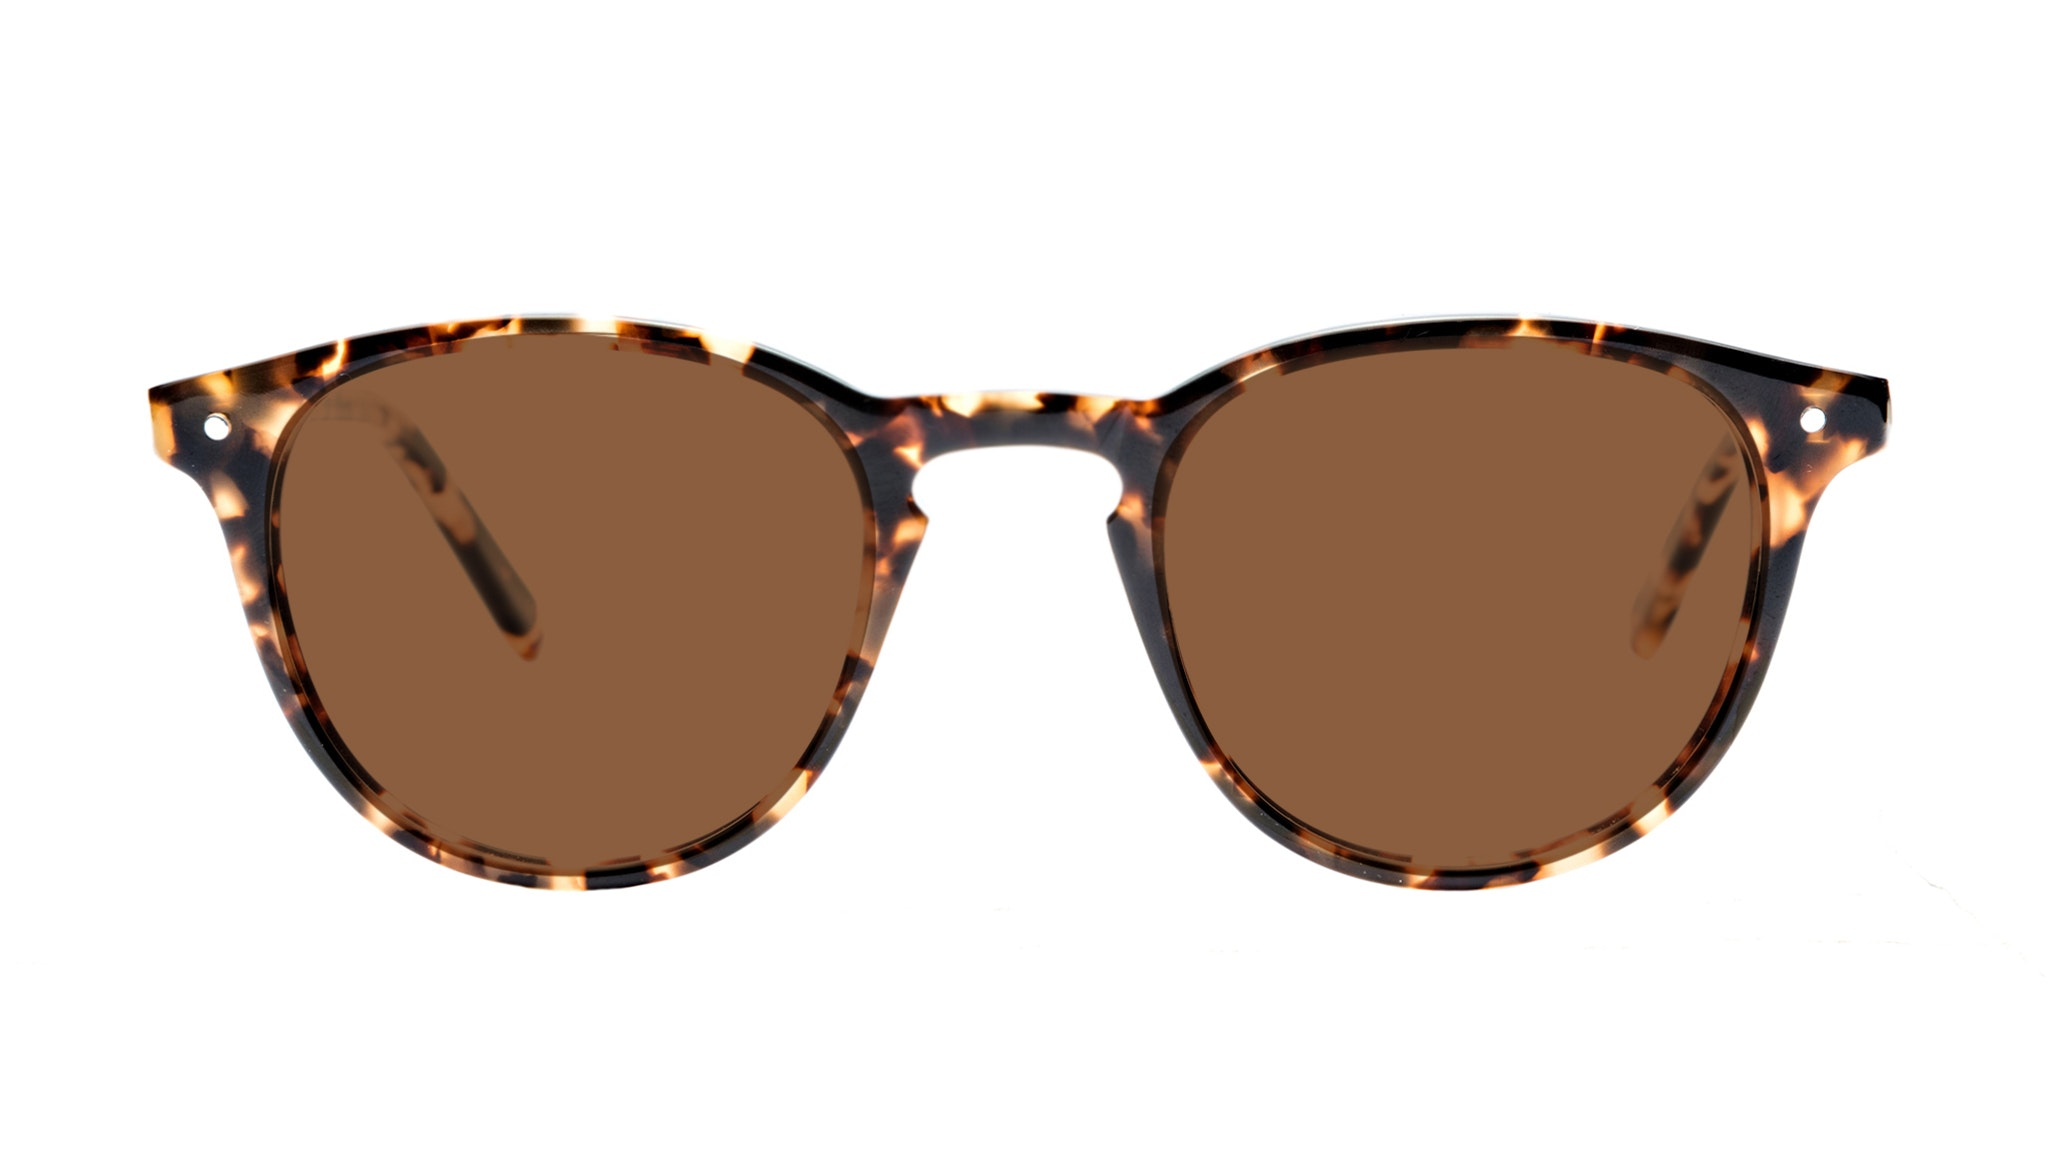 Affordable Fashion Glasses Round Sunglasses Men Cult Dark Tortoise